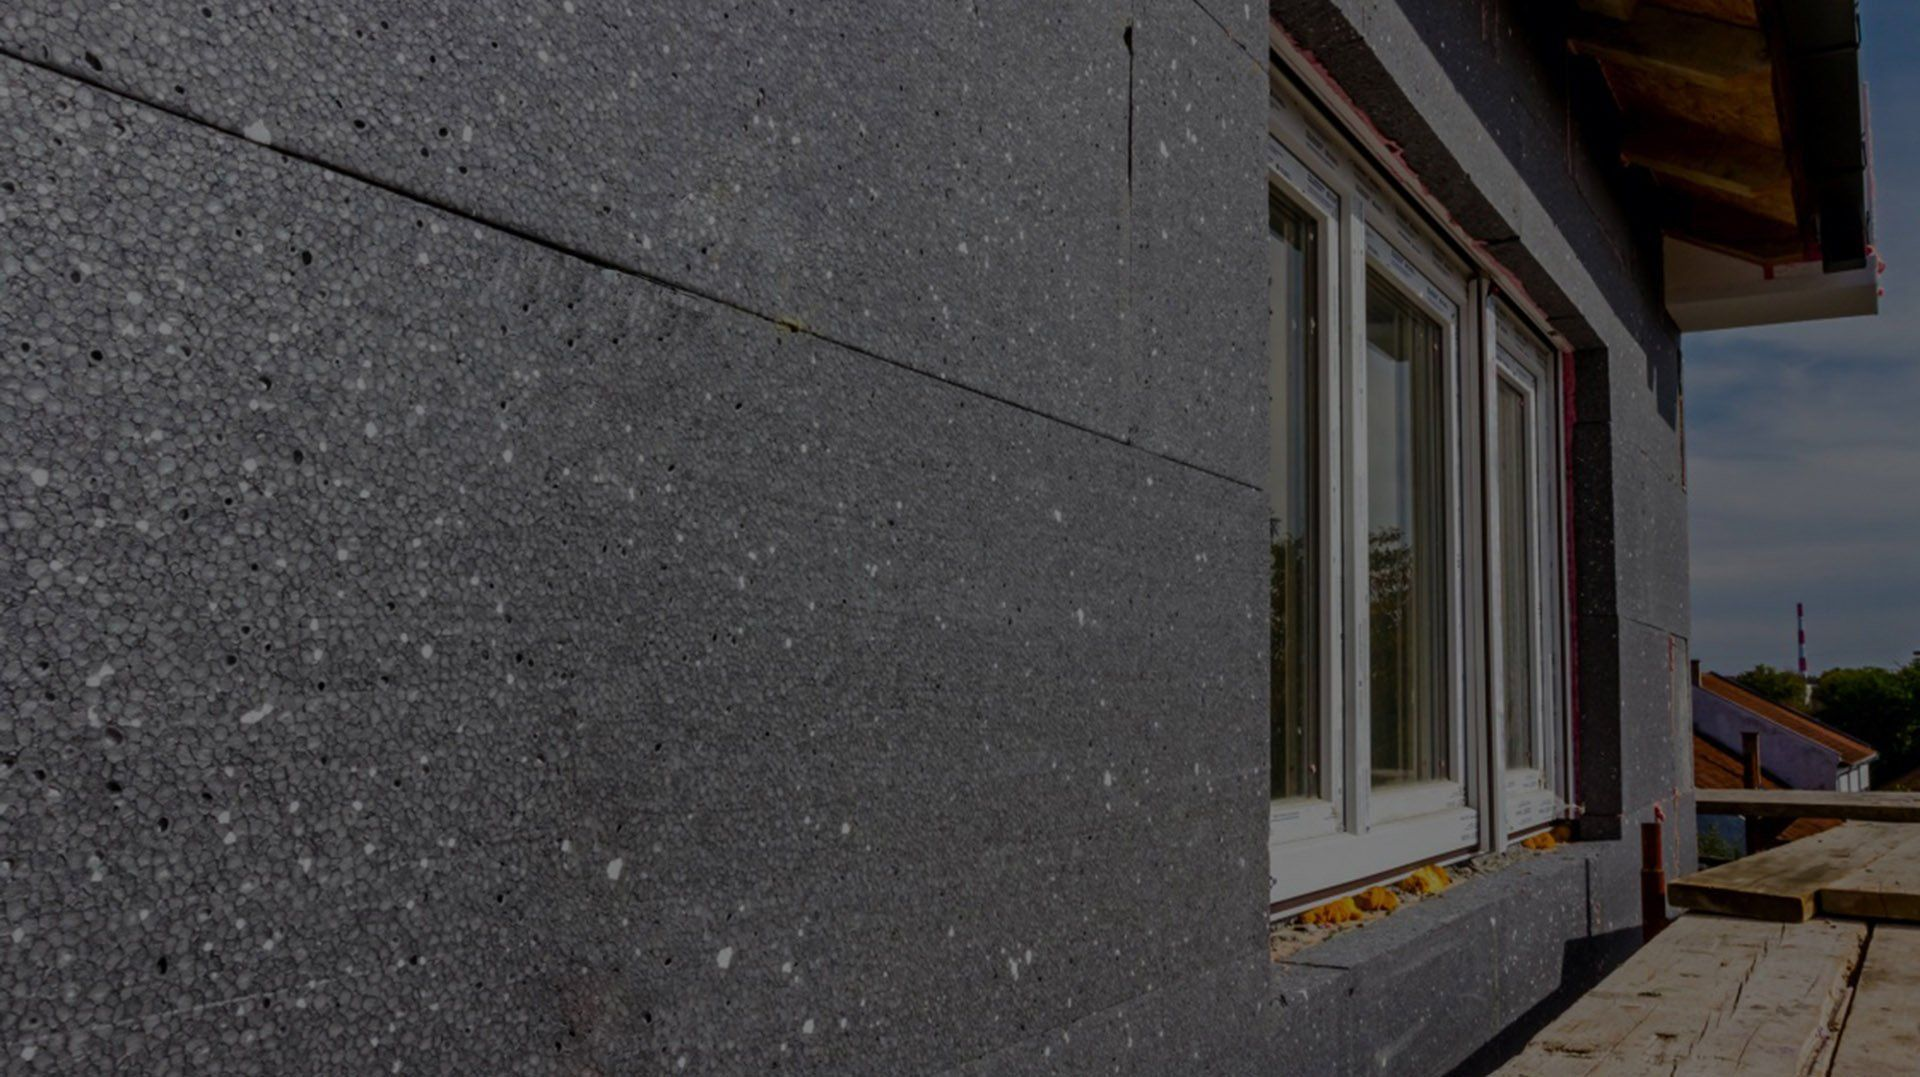 Rehabilitacion de fachadas en San Sebastian - Rehabilitaciones Energéticas